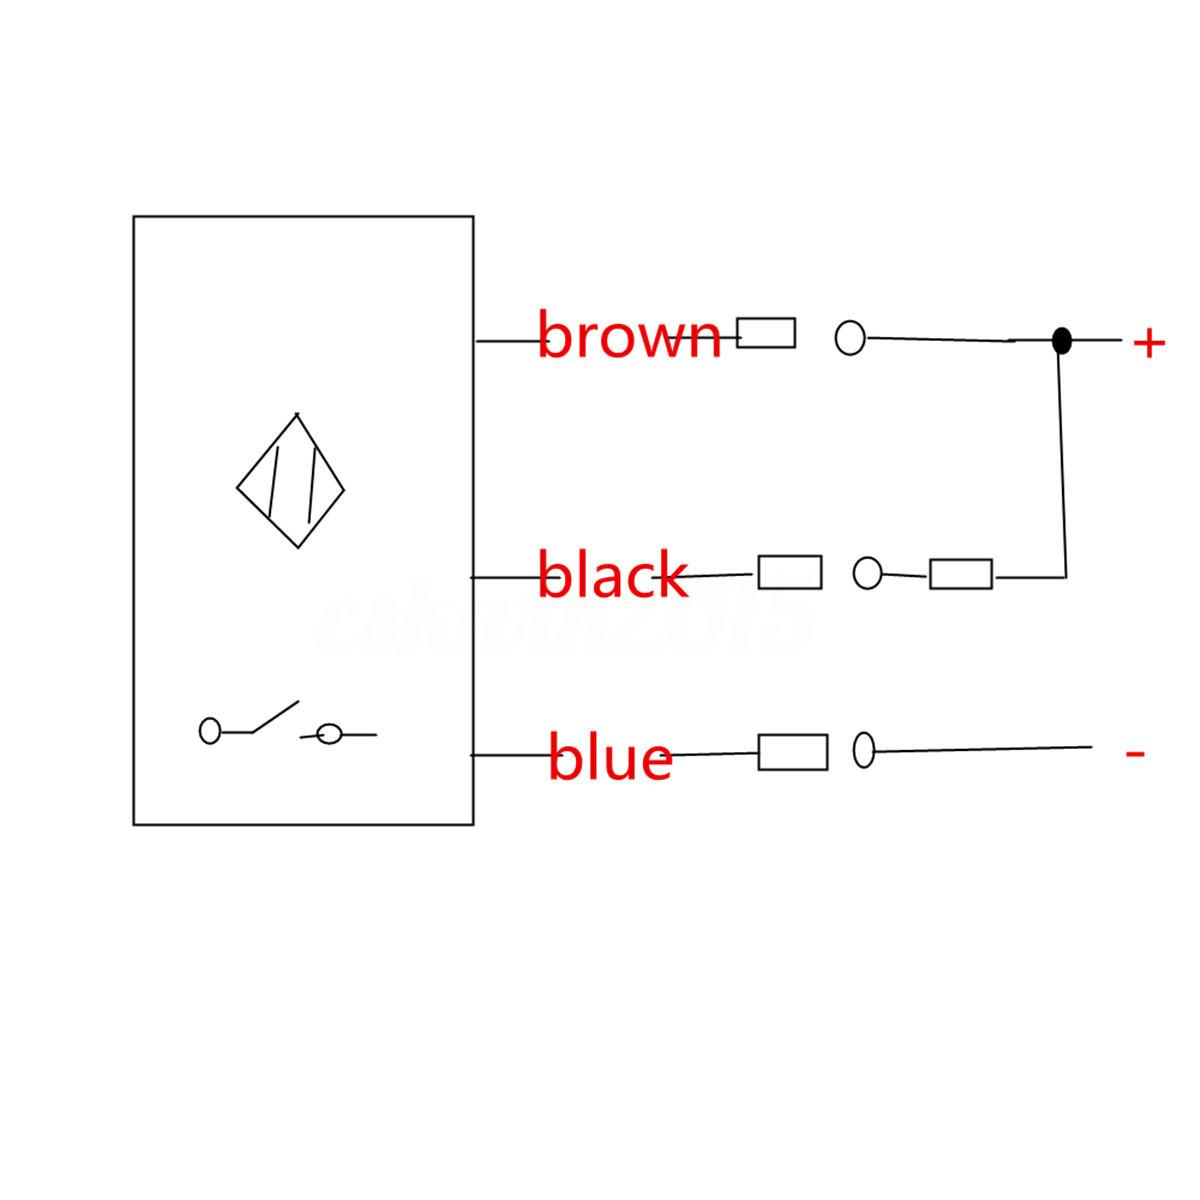 Digital Tachometer Wiring Question